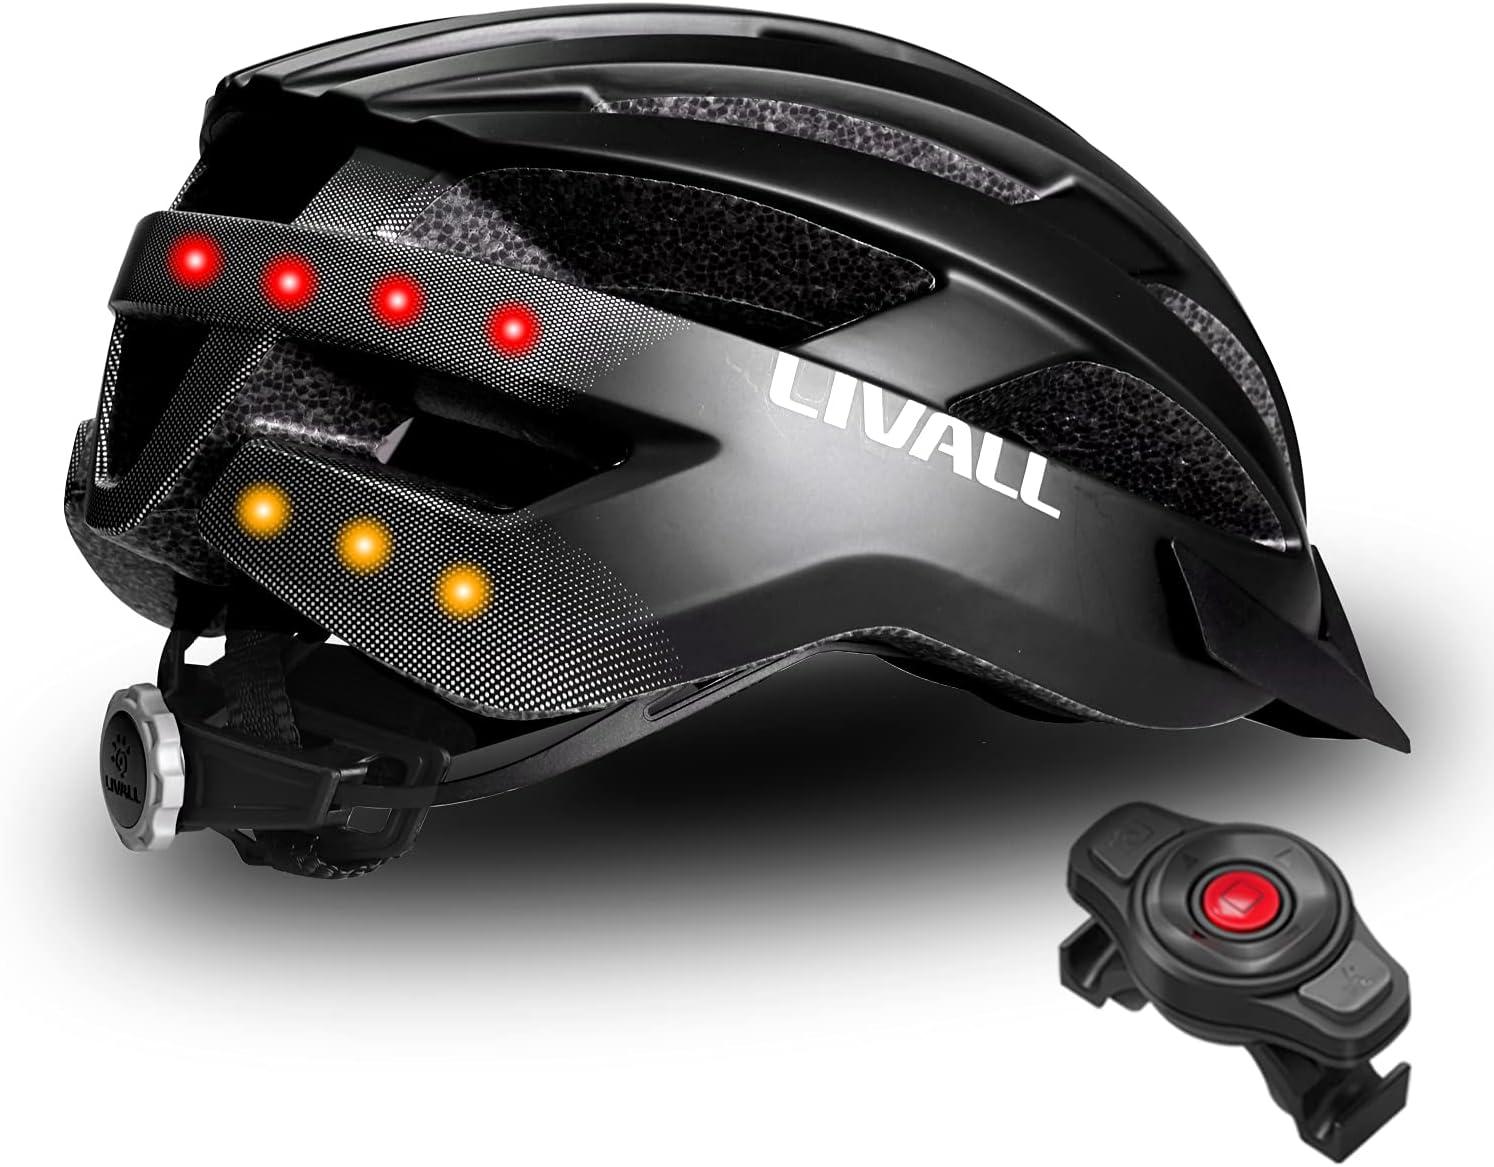 LIVALL 2021 new MT1 NEO Adult Smart Popular brand Bike with Light Turn Signal an Helmet